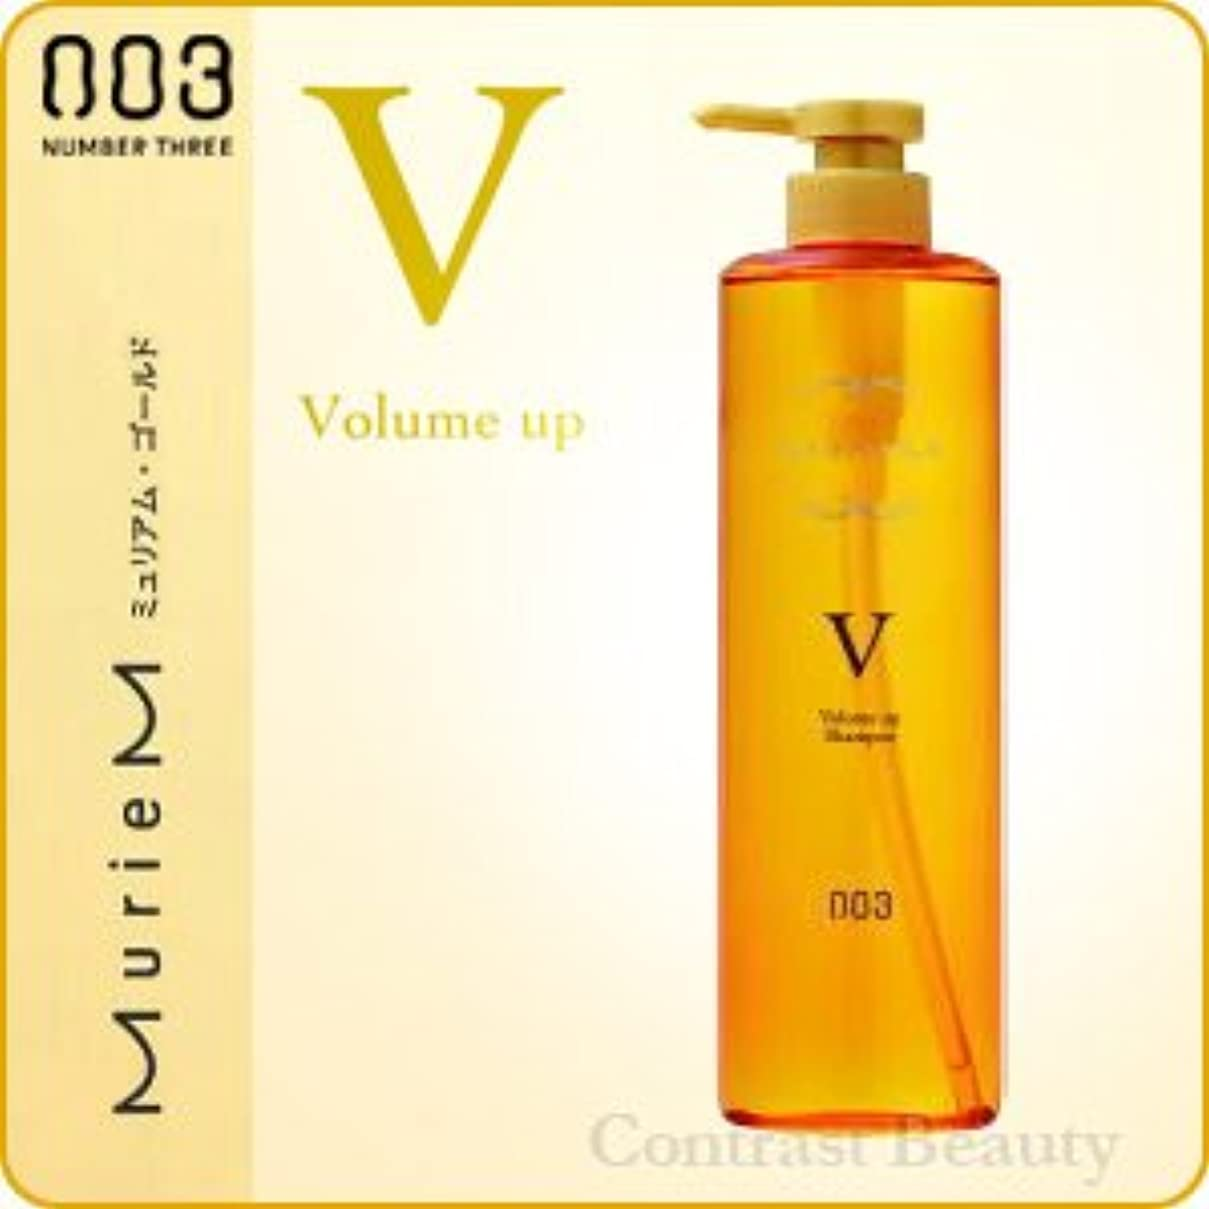 【X5個セット】 ナンバースリー ミュリアム ゴールド シャンプー V 660ml